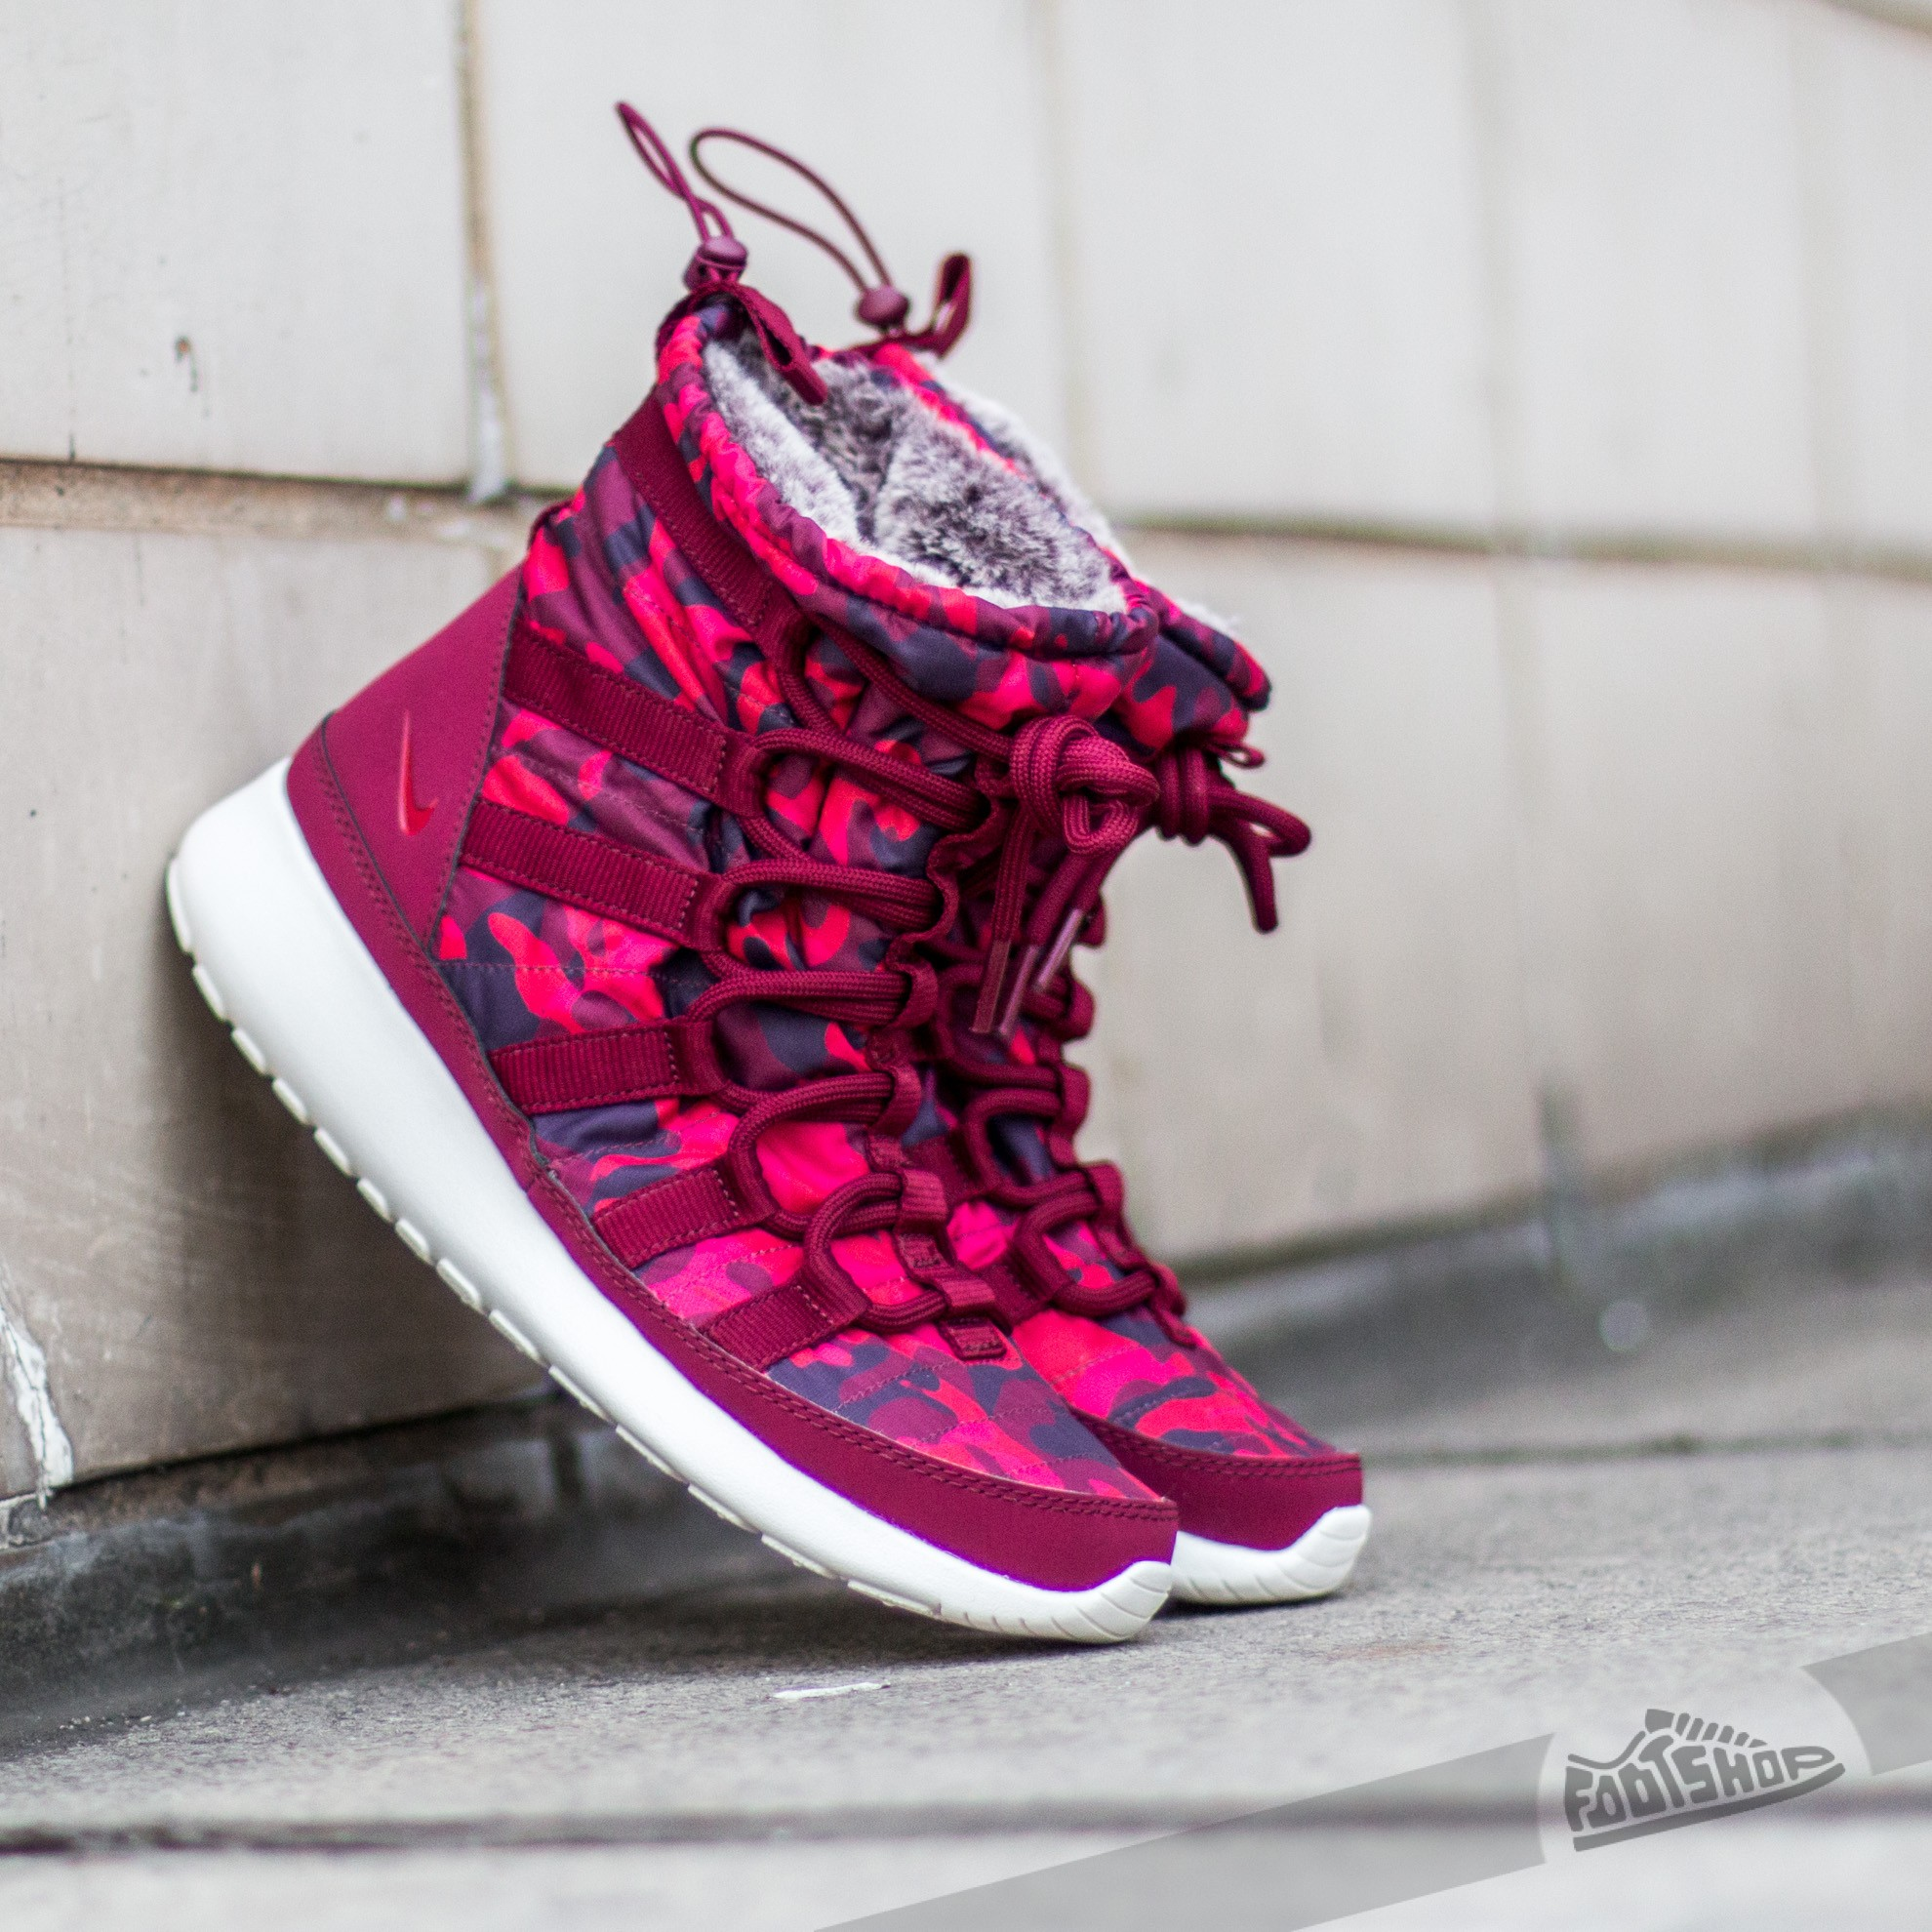 finest selection ce8d2 190d7 Nike WMNS Roshe One Hi Print Deep Garnet/ Gym Red- Very ...